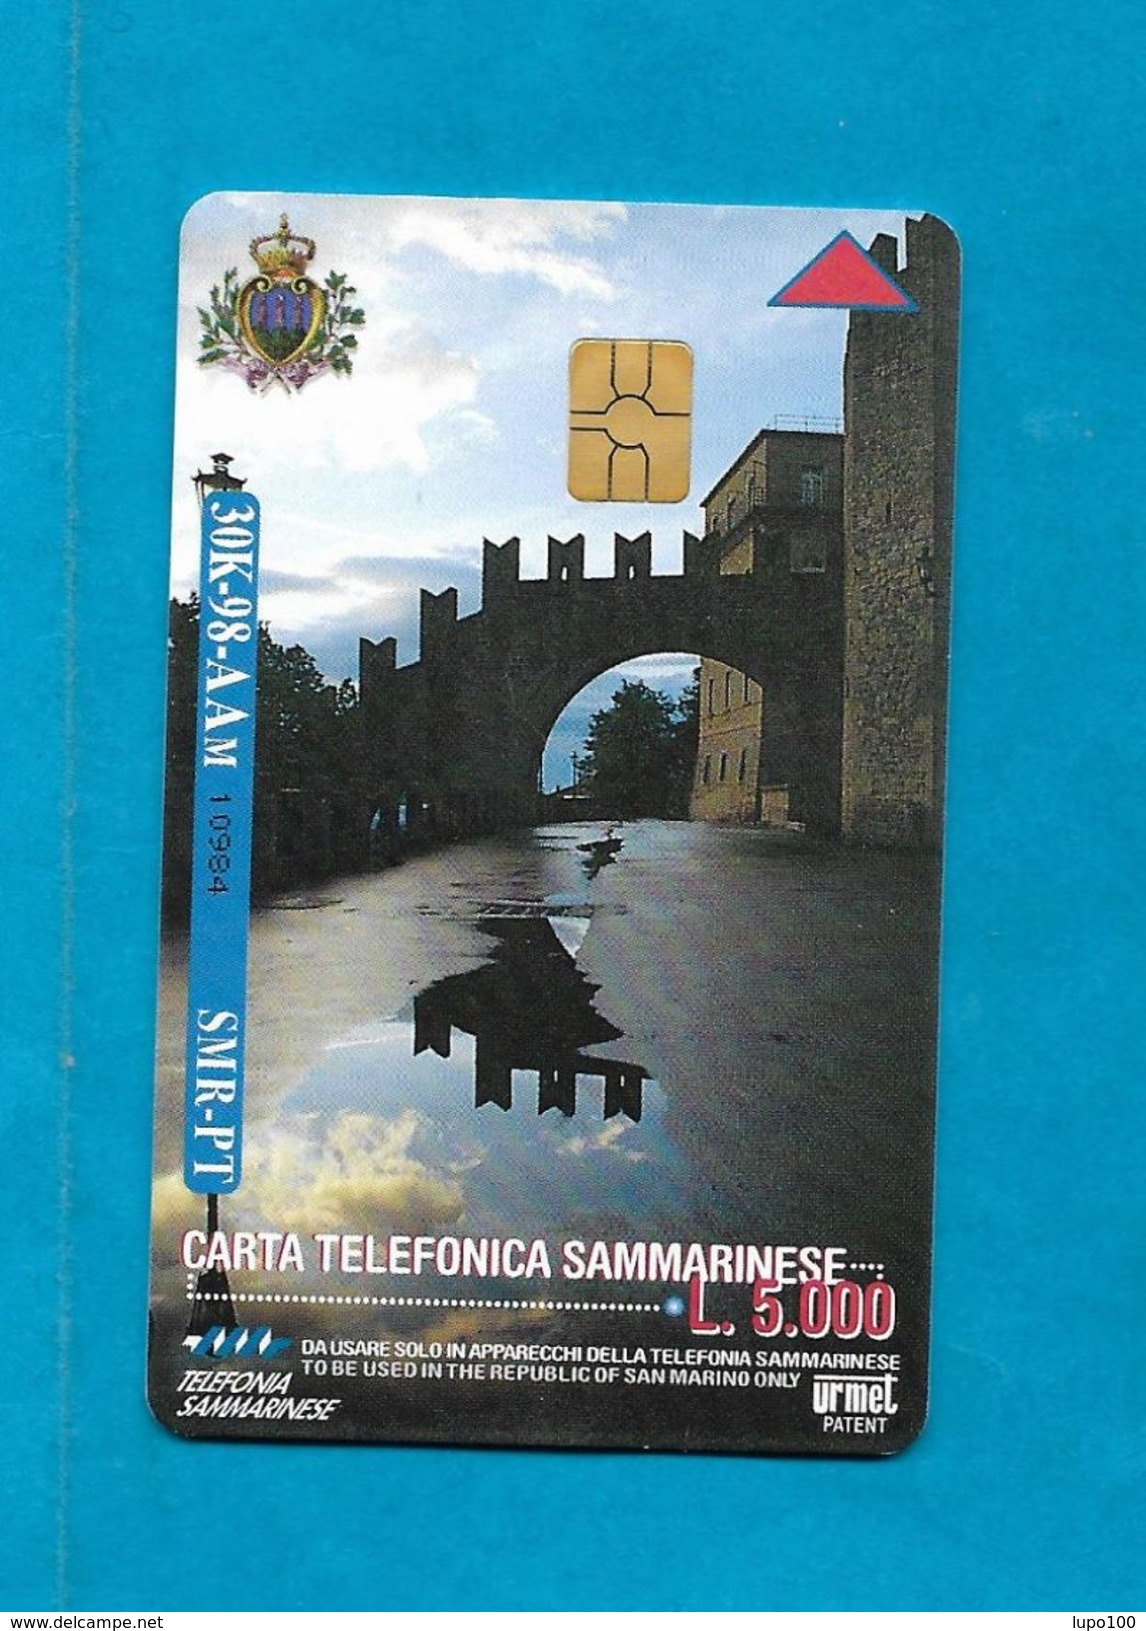 SAN MARINO SCHEDA TELEFONICA NUOVA NEW PHONECARD 30 - MEETING PER L'AMICIZIA FRA I POPOLI RIMINI 98 - San Marino